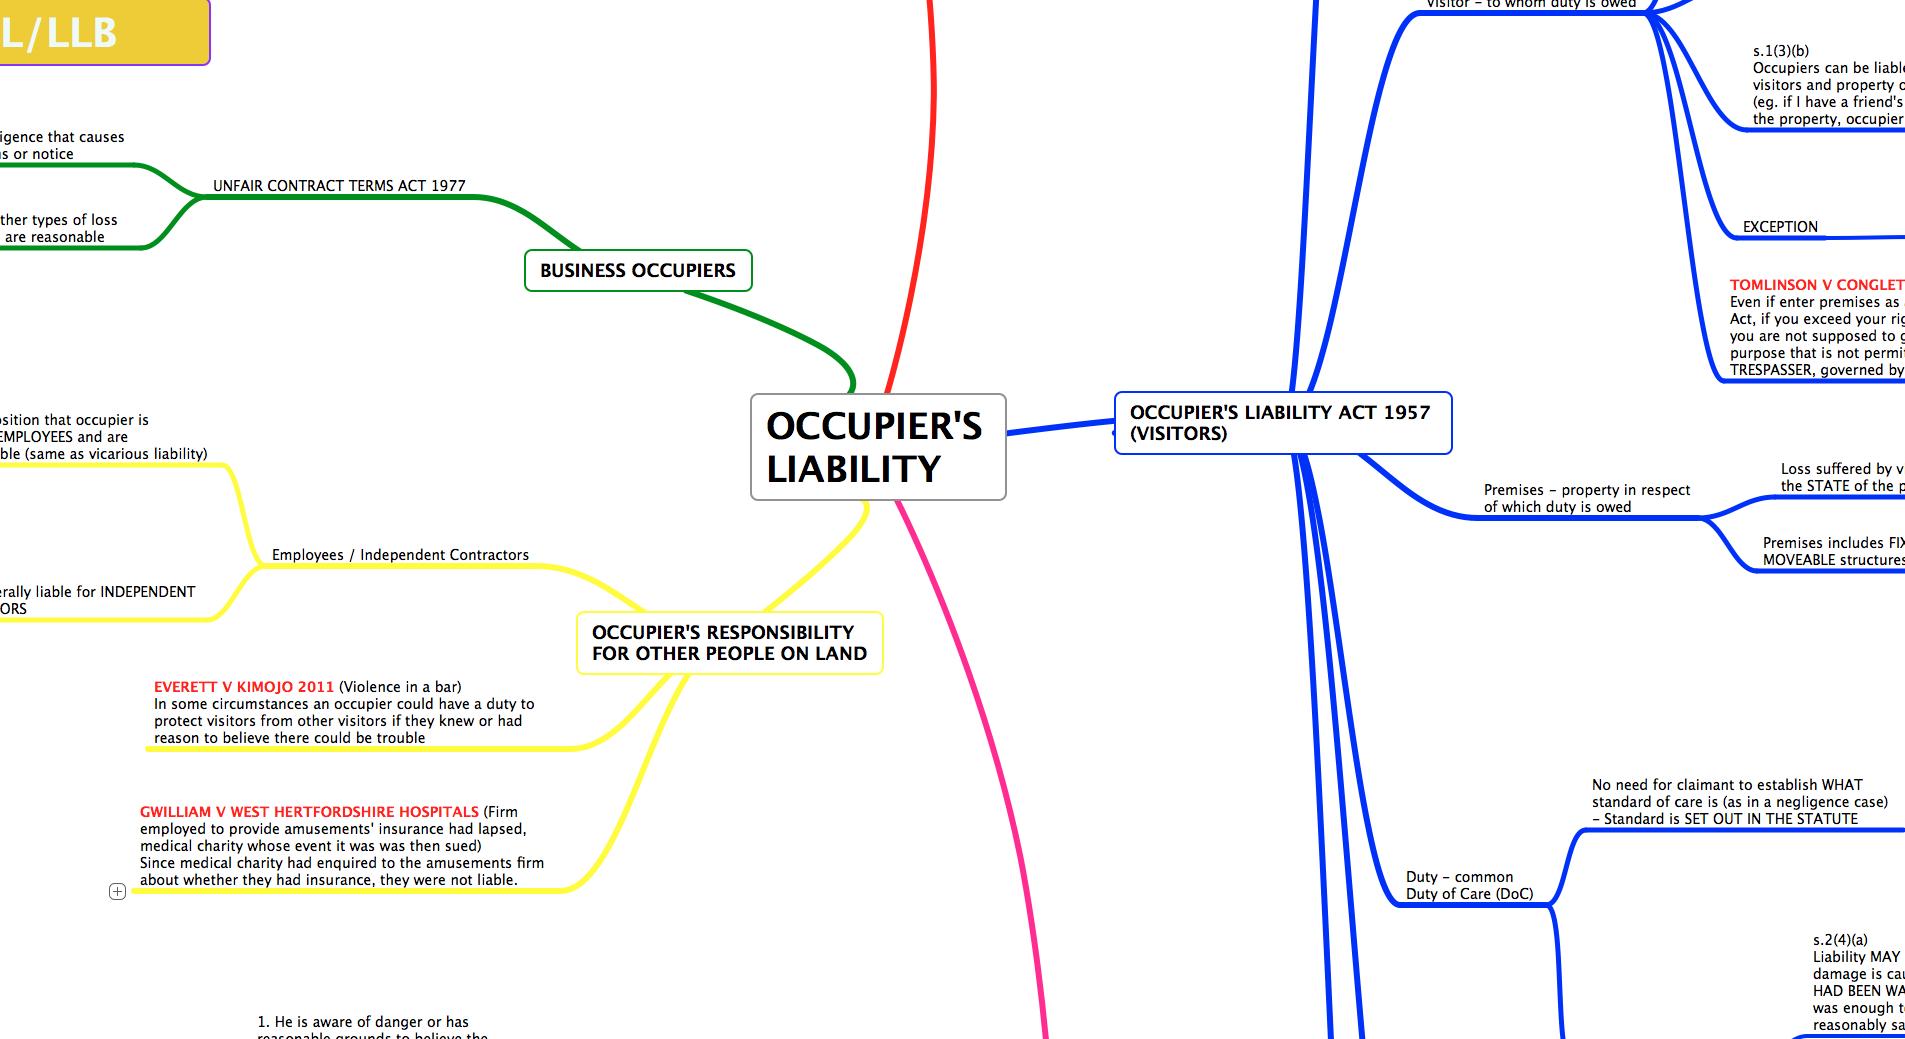 OCCUPIER'S LIABILITY